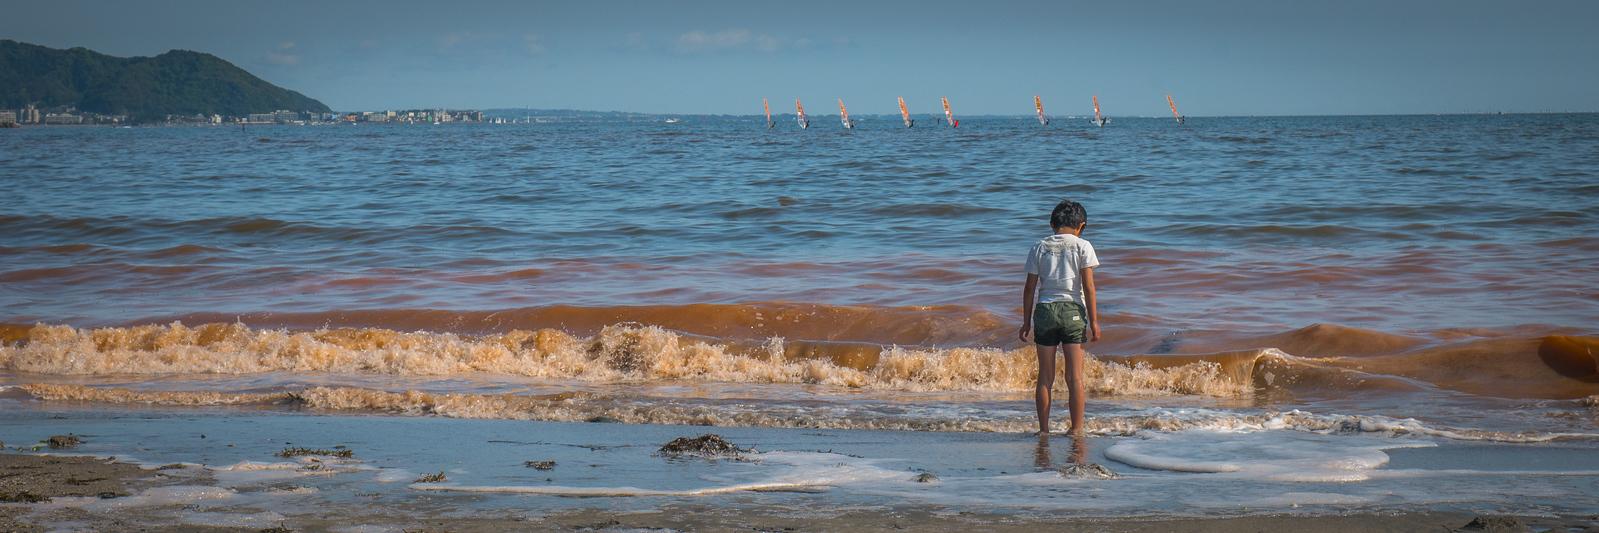 kamakura beach with red tide algae